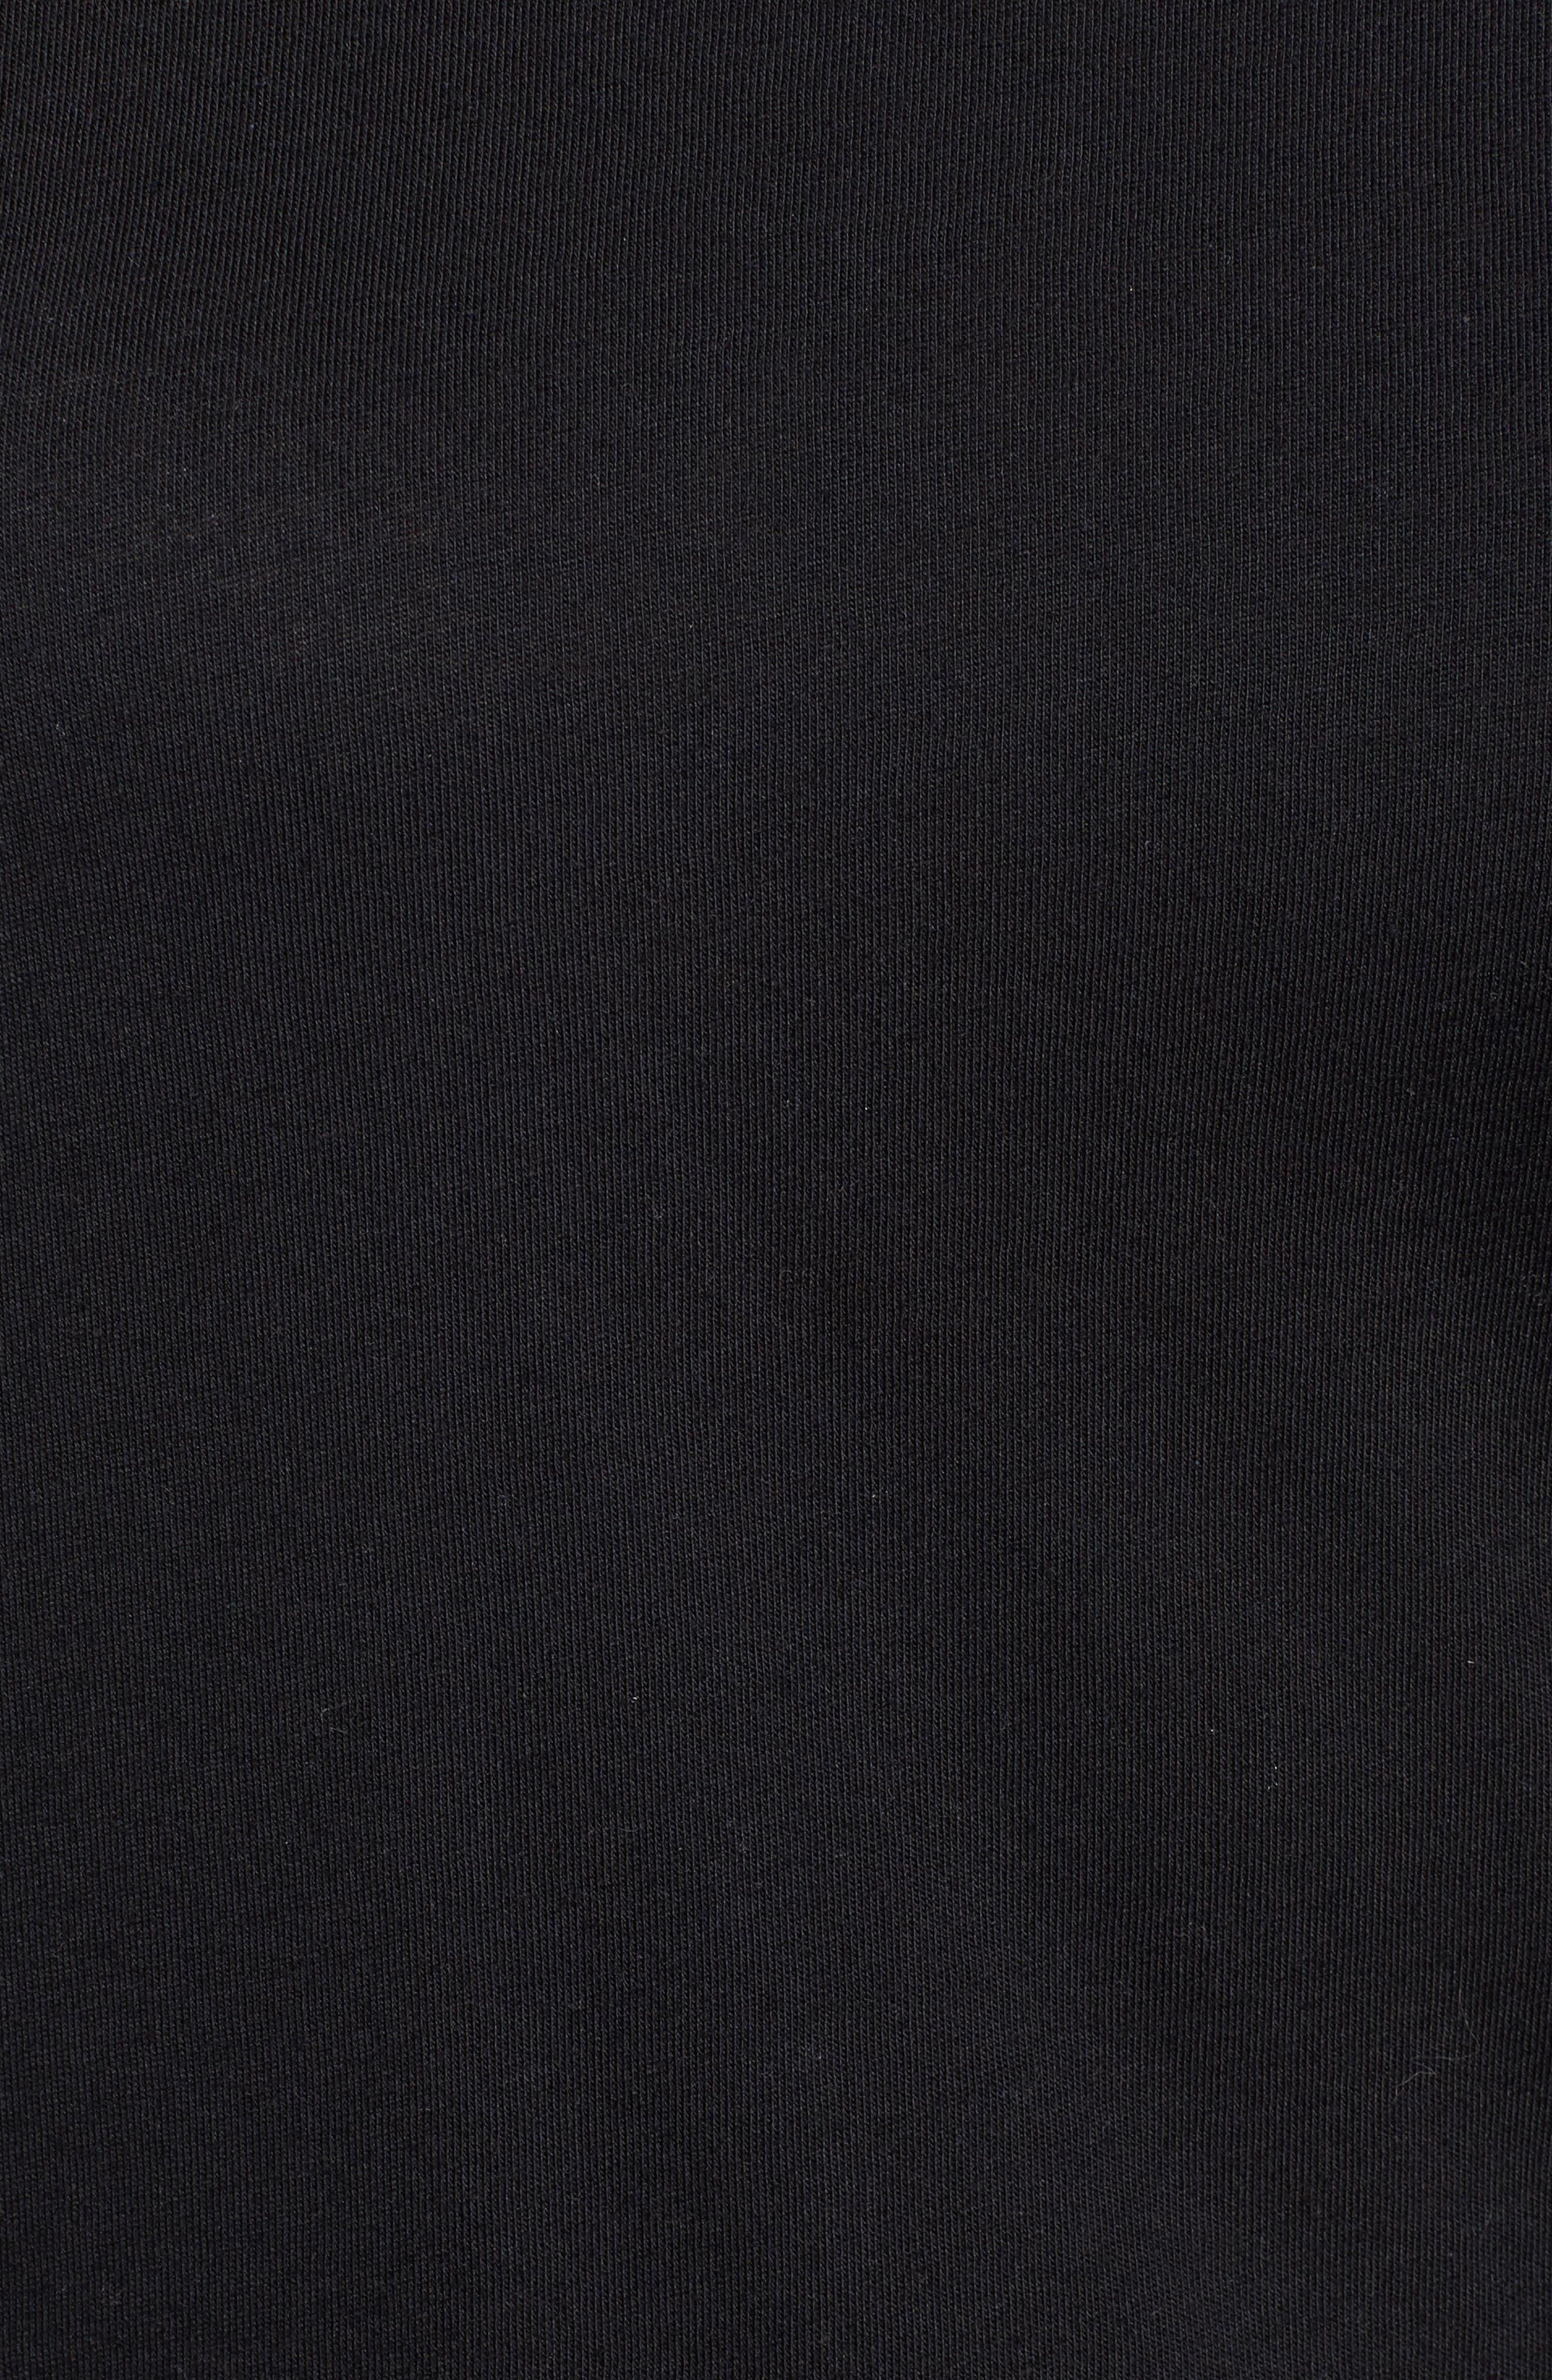 Long Sleeve Tee,                             Alternate thumbnail 5, color,                             BLACK